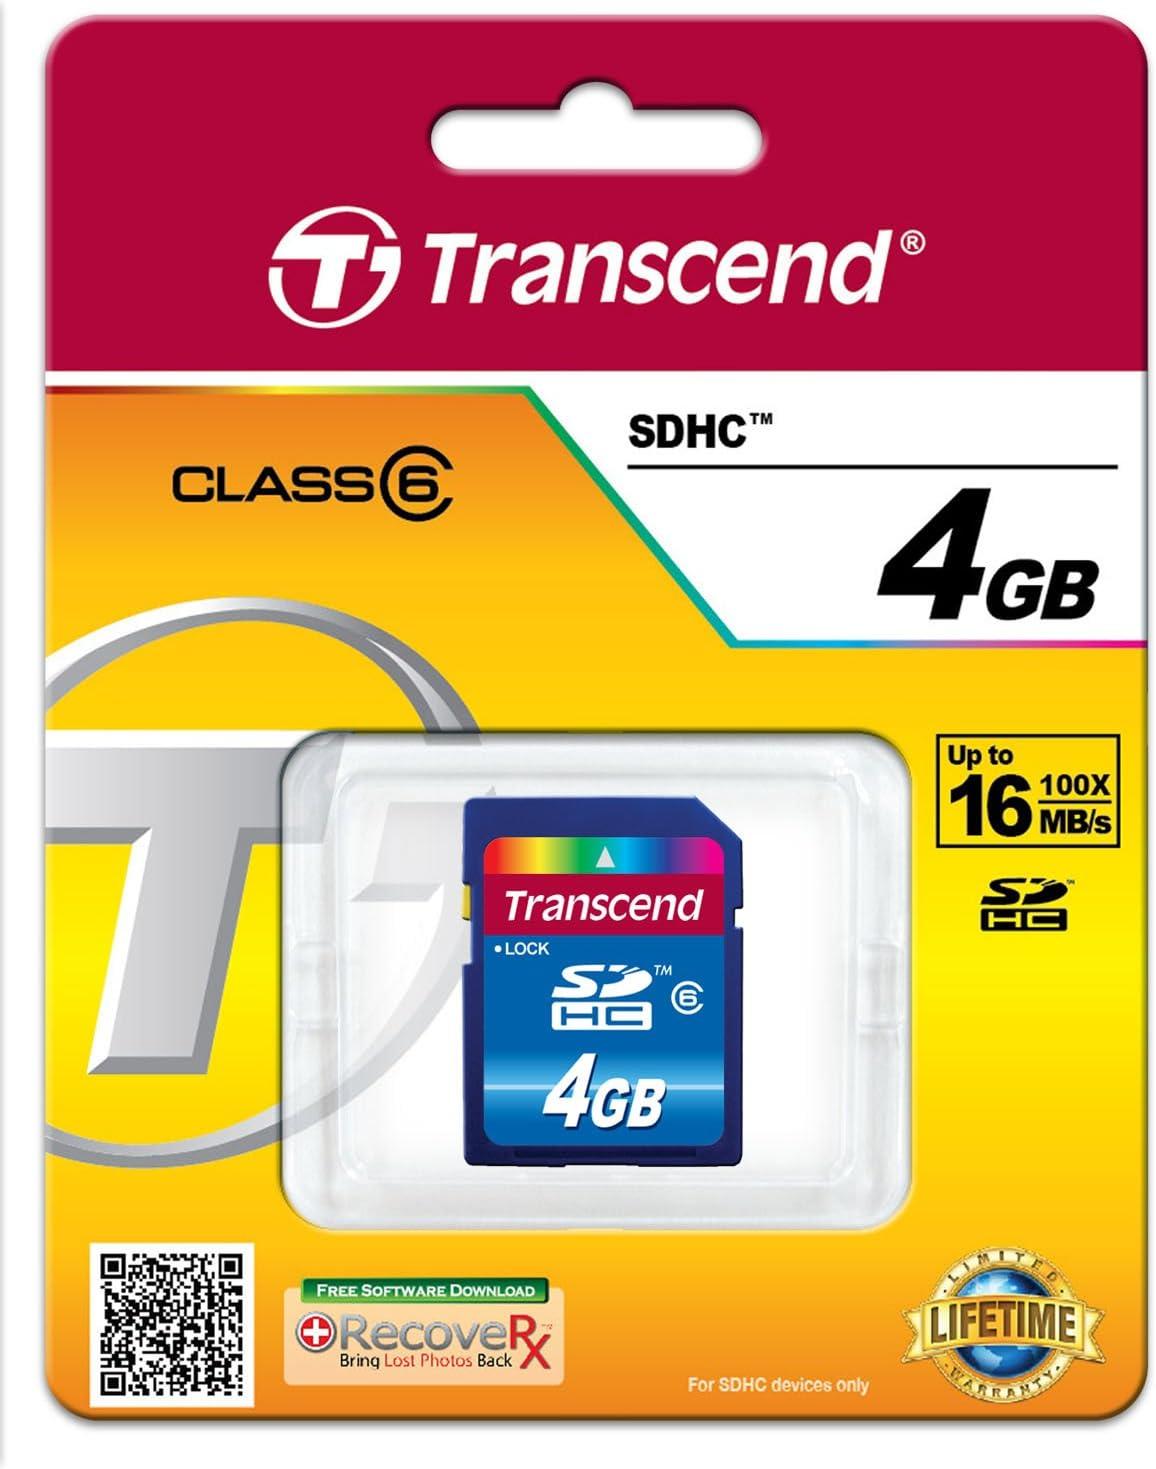 Transcend 4 GB Class 6 SDHC Flash Memory Card TS4GSDHC6